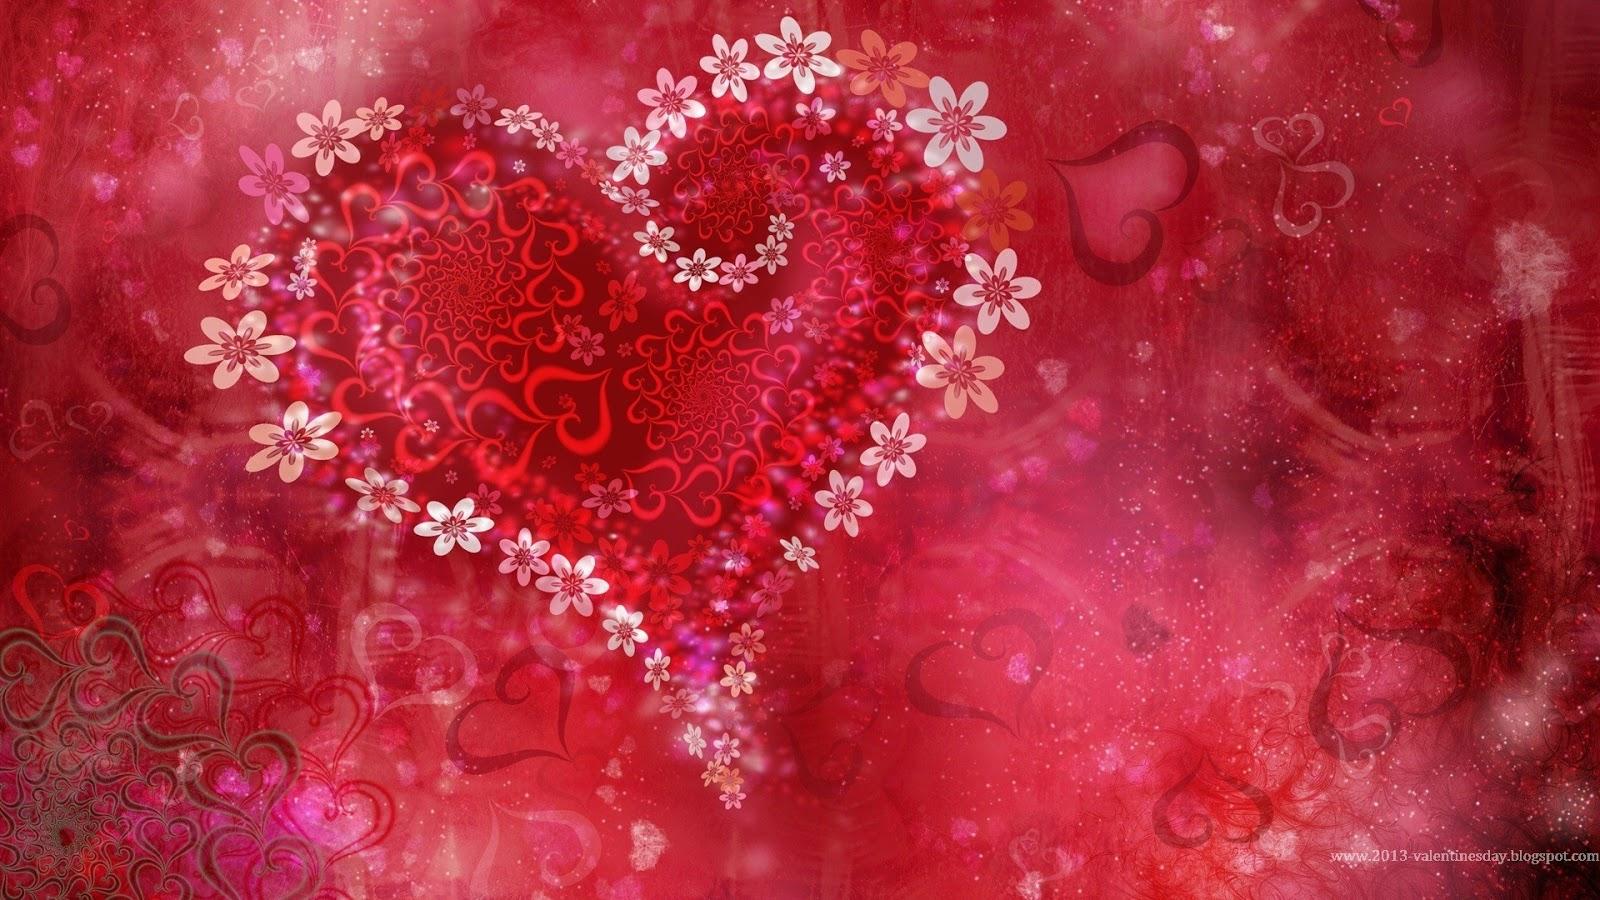 wallpaper wallpapers hearts - photo #31